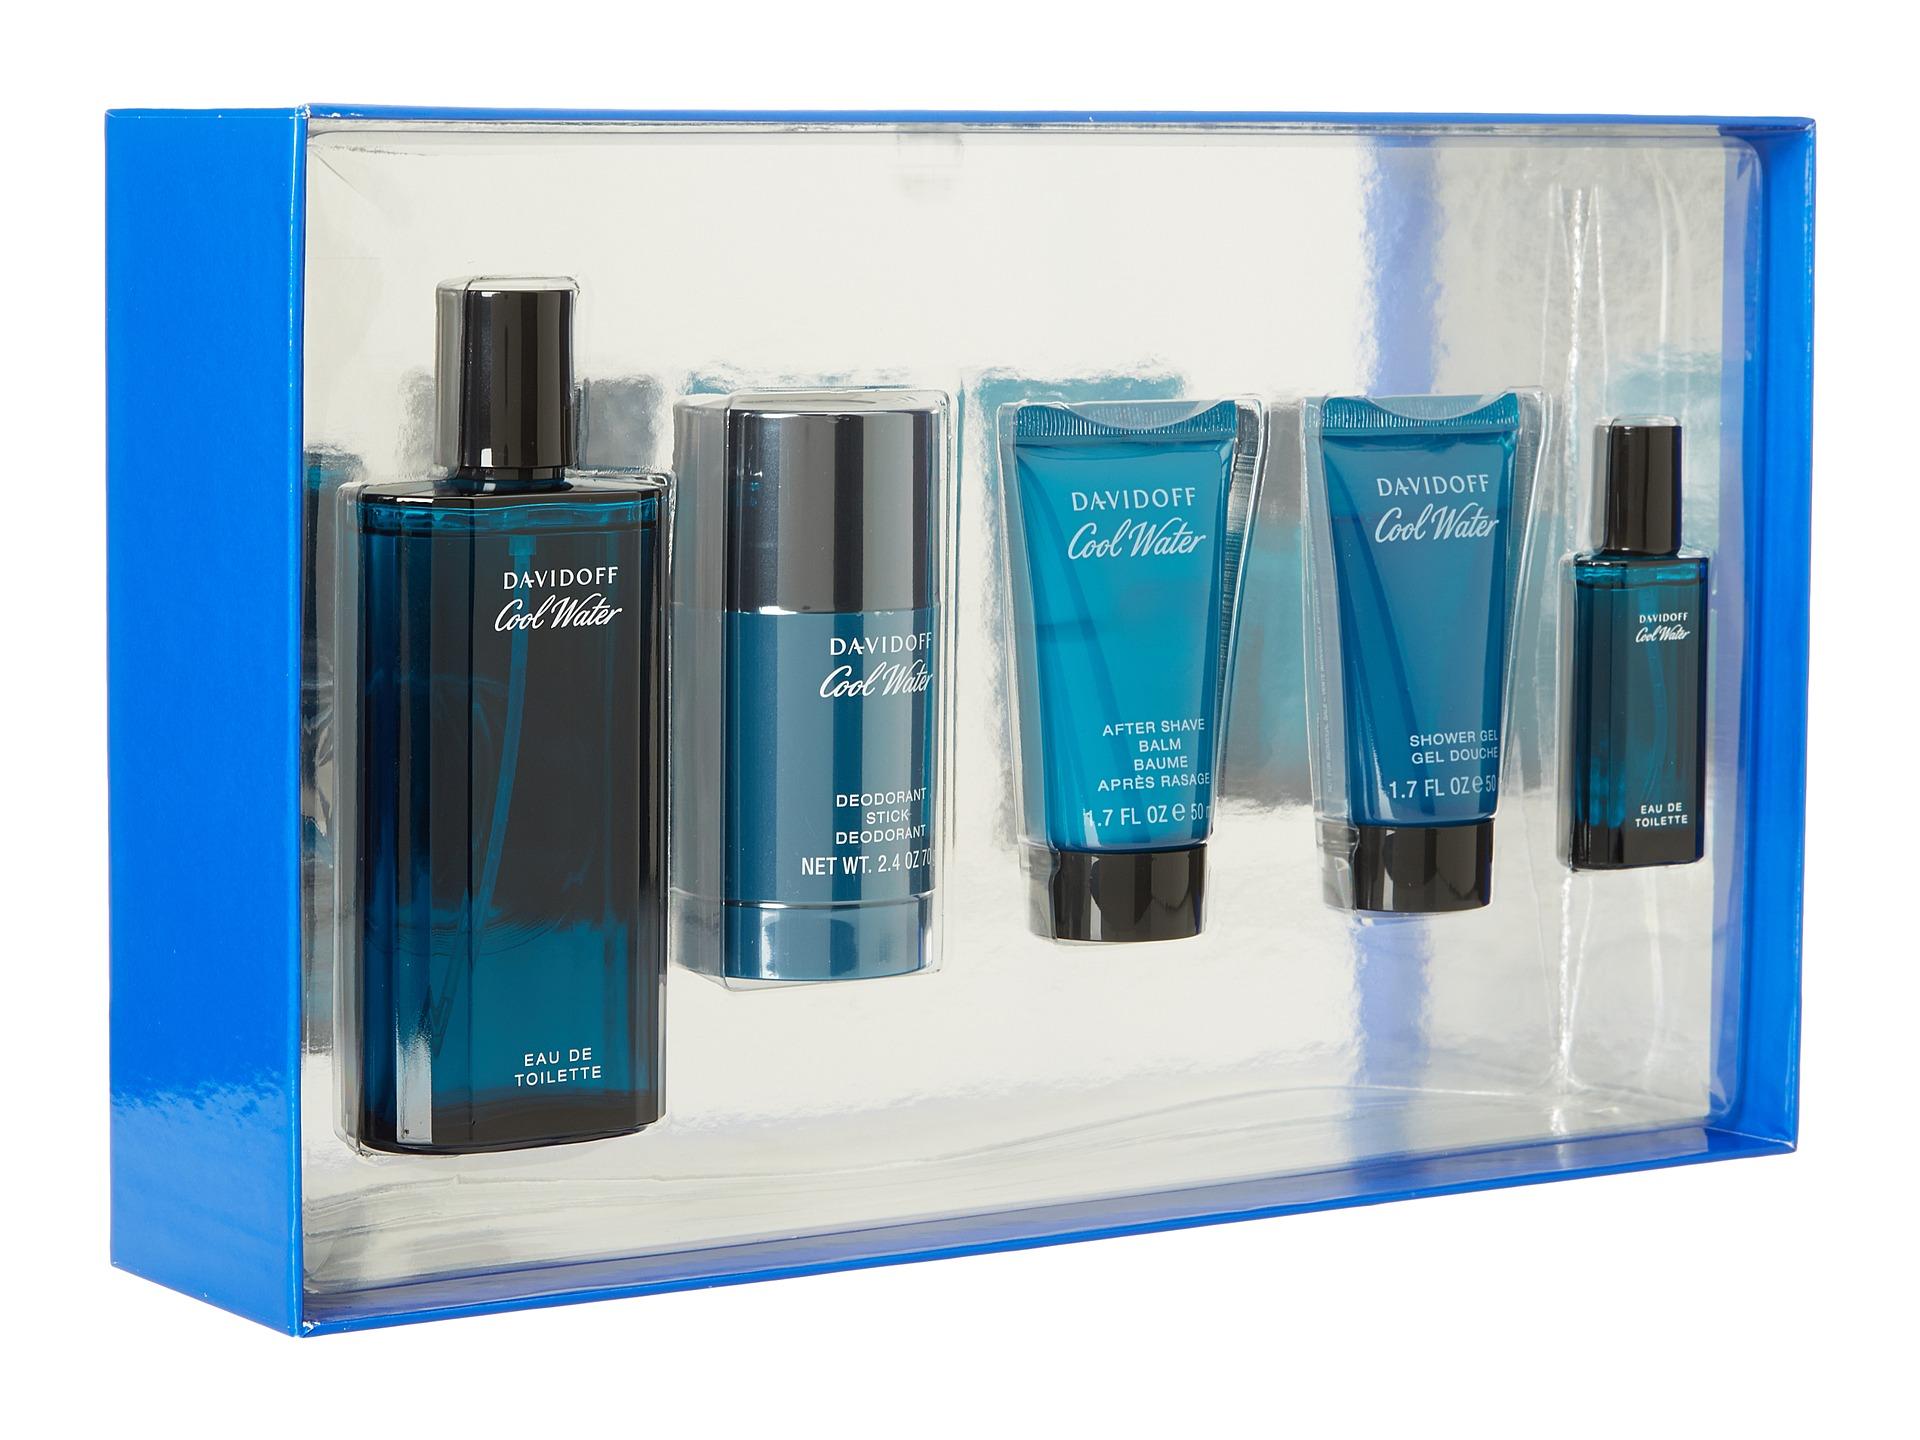 davidoff cool water for men set shipped free at zappos